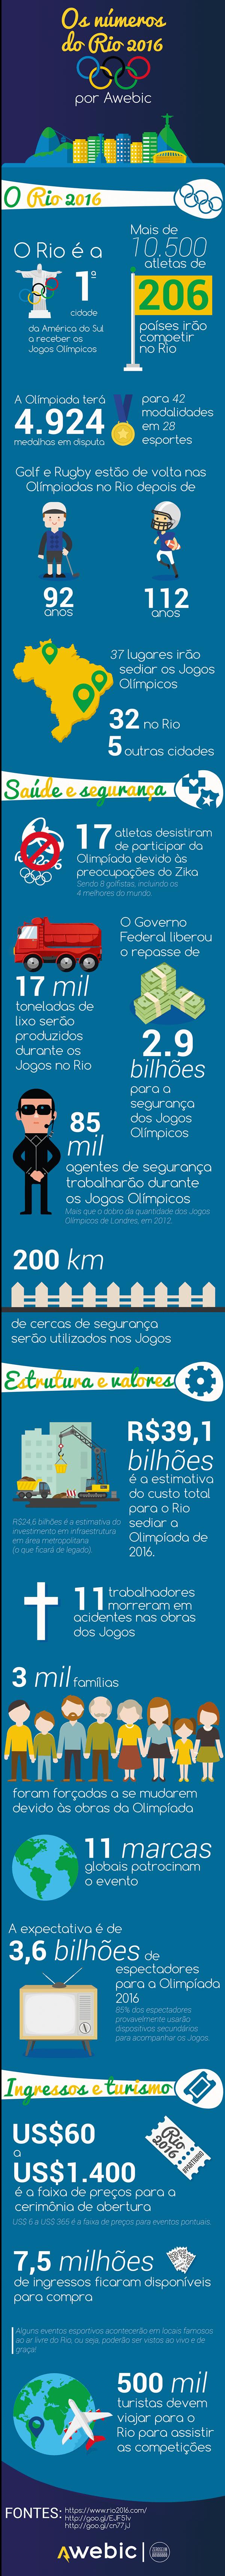 Infográfico Olimpíada Rio 2016 Awebic